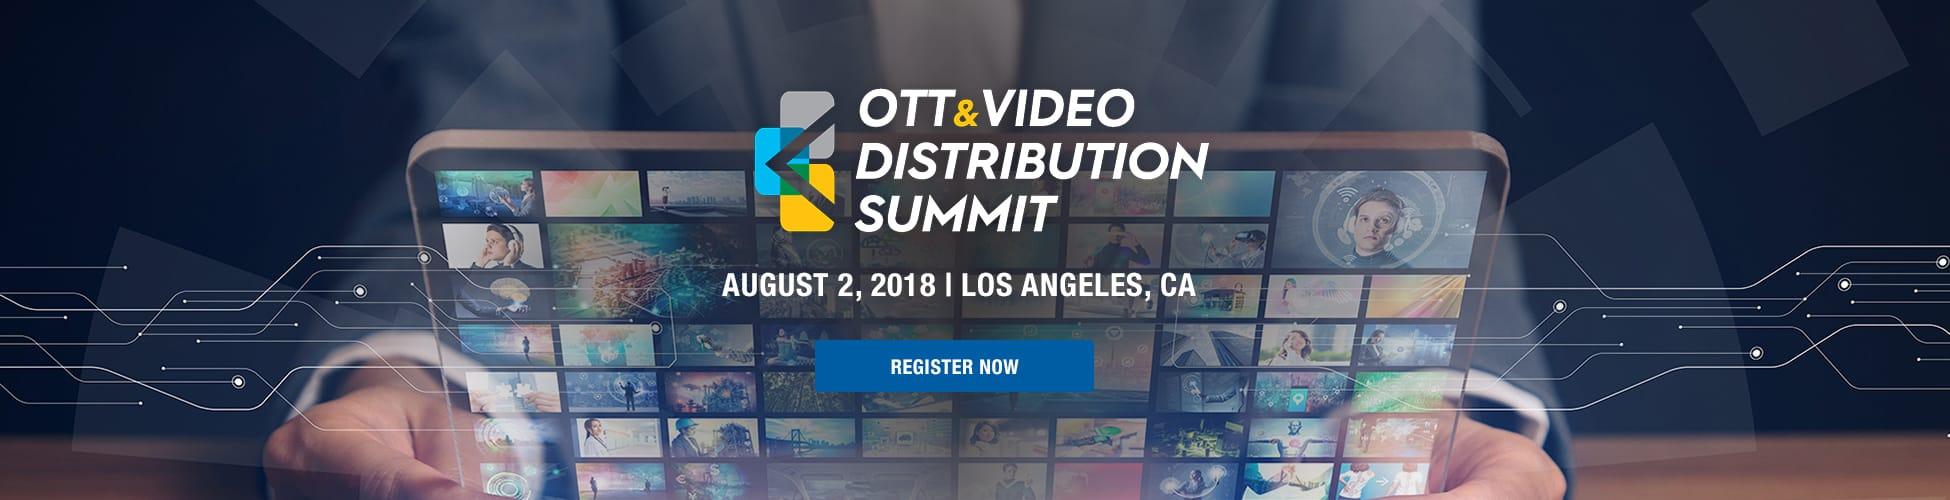 OTT & Content Video Distribution Summit